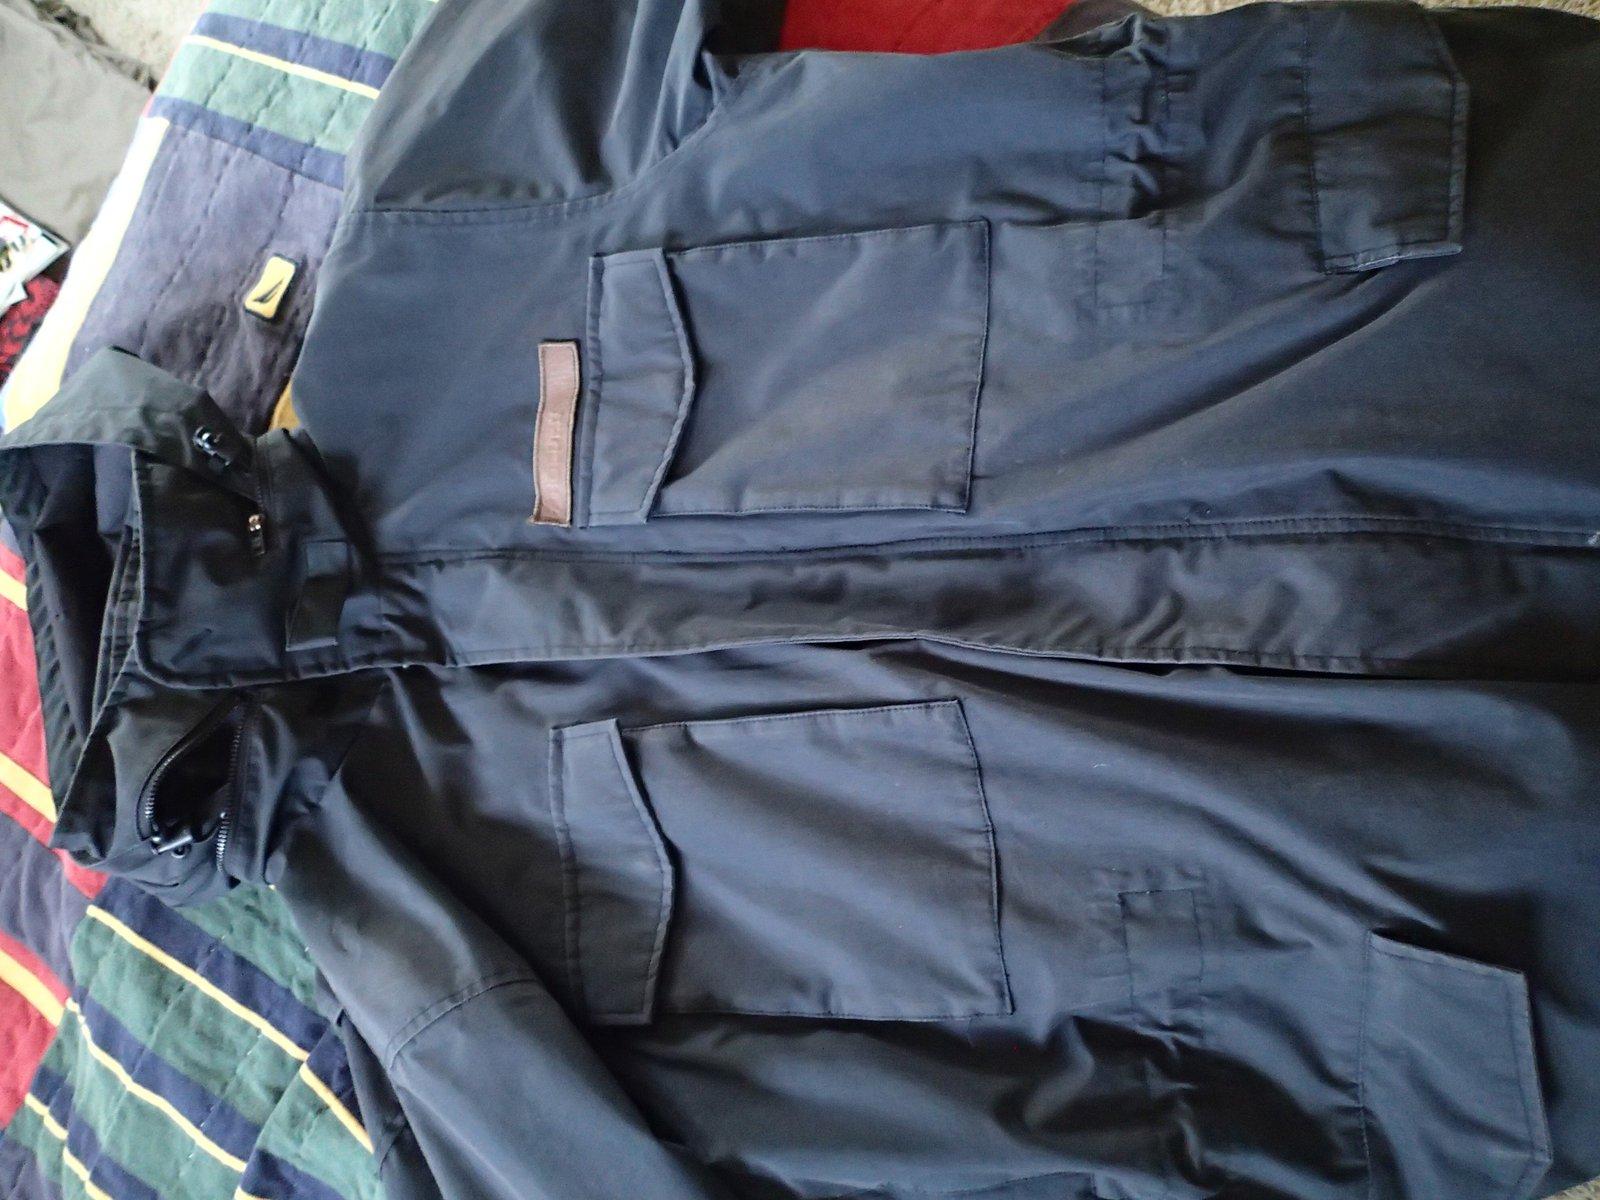 Holden jacket